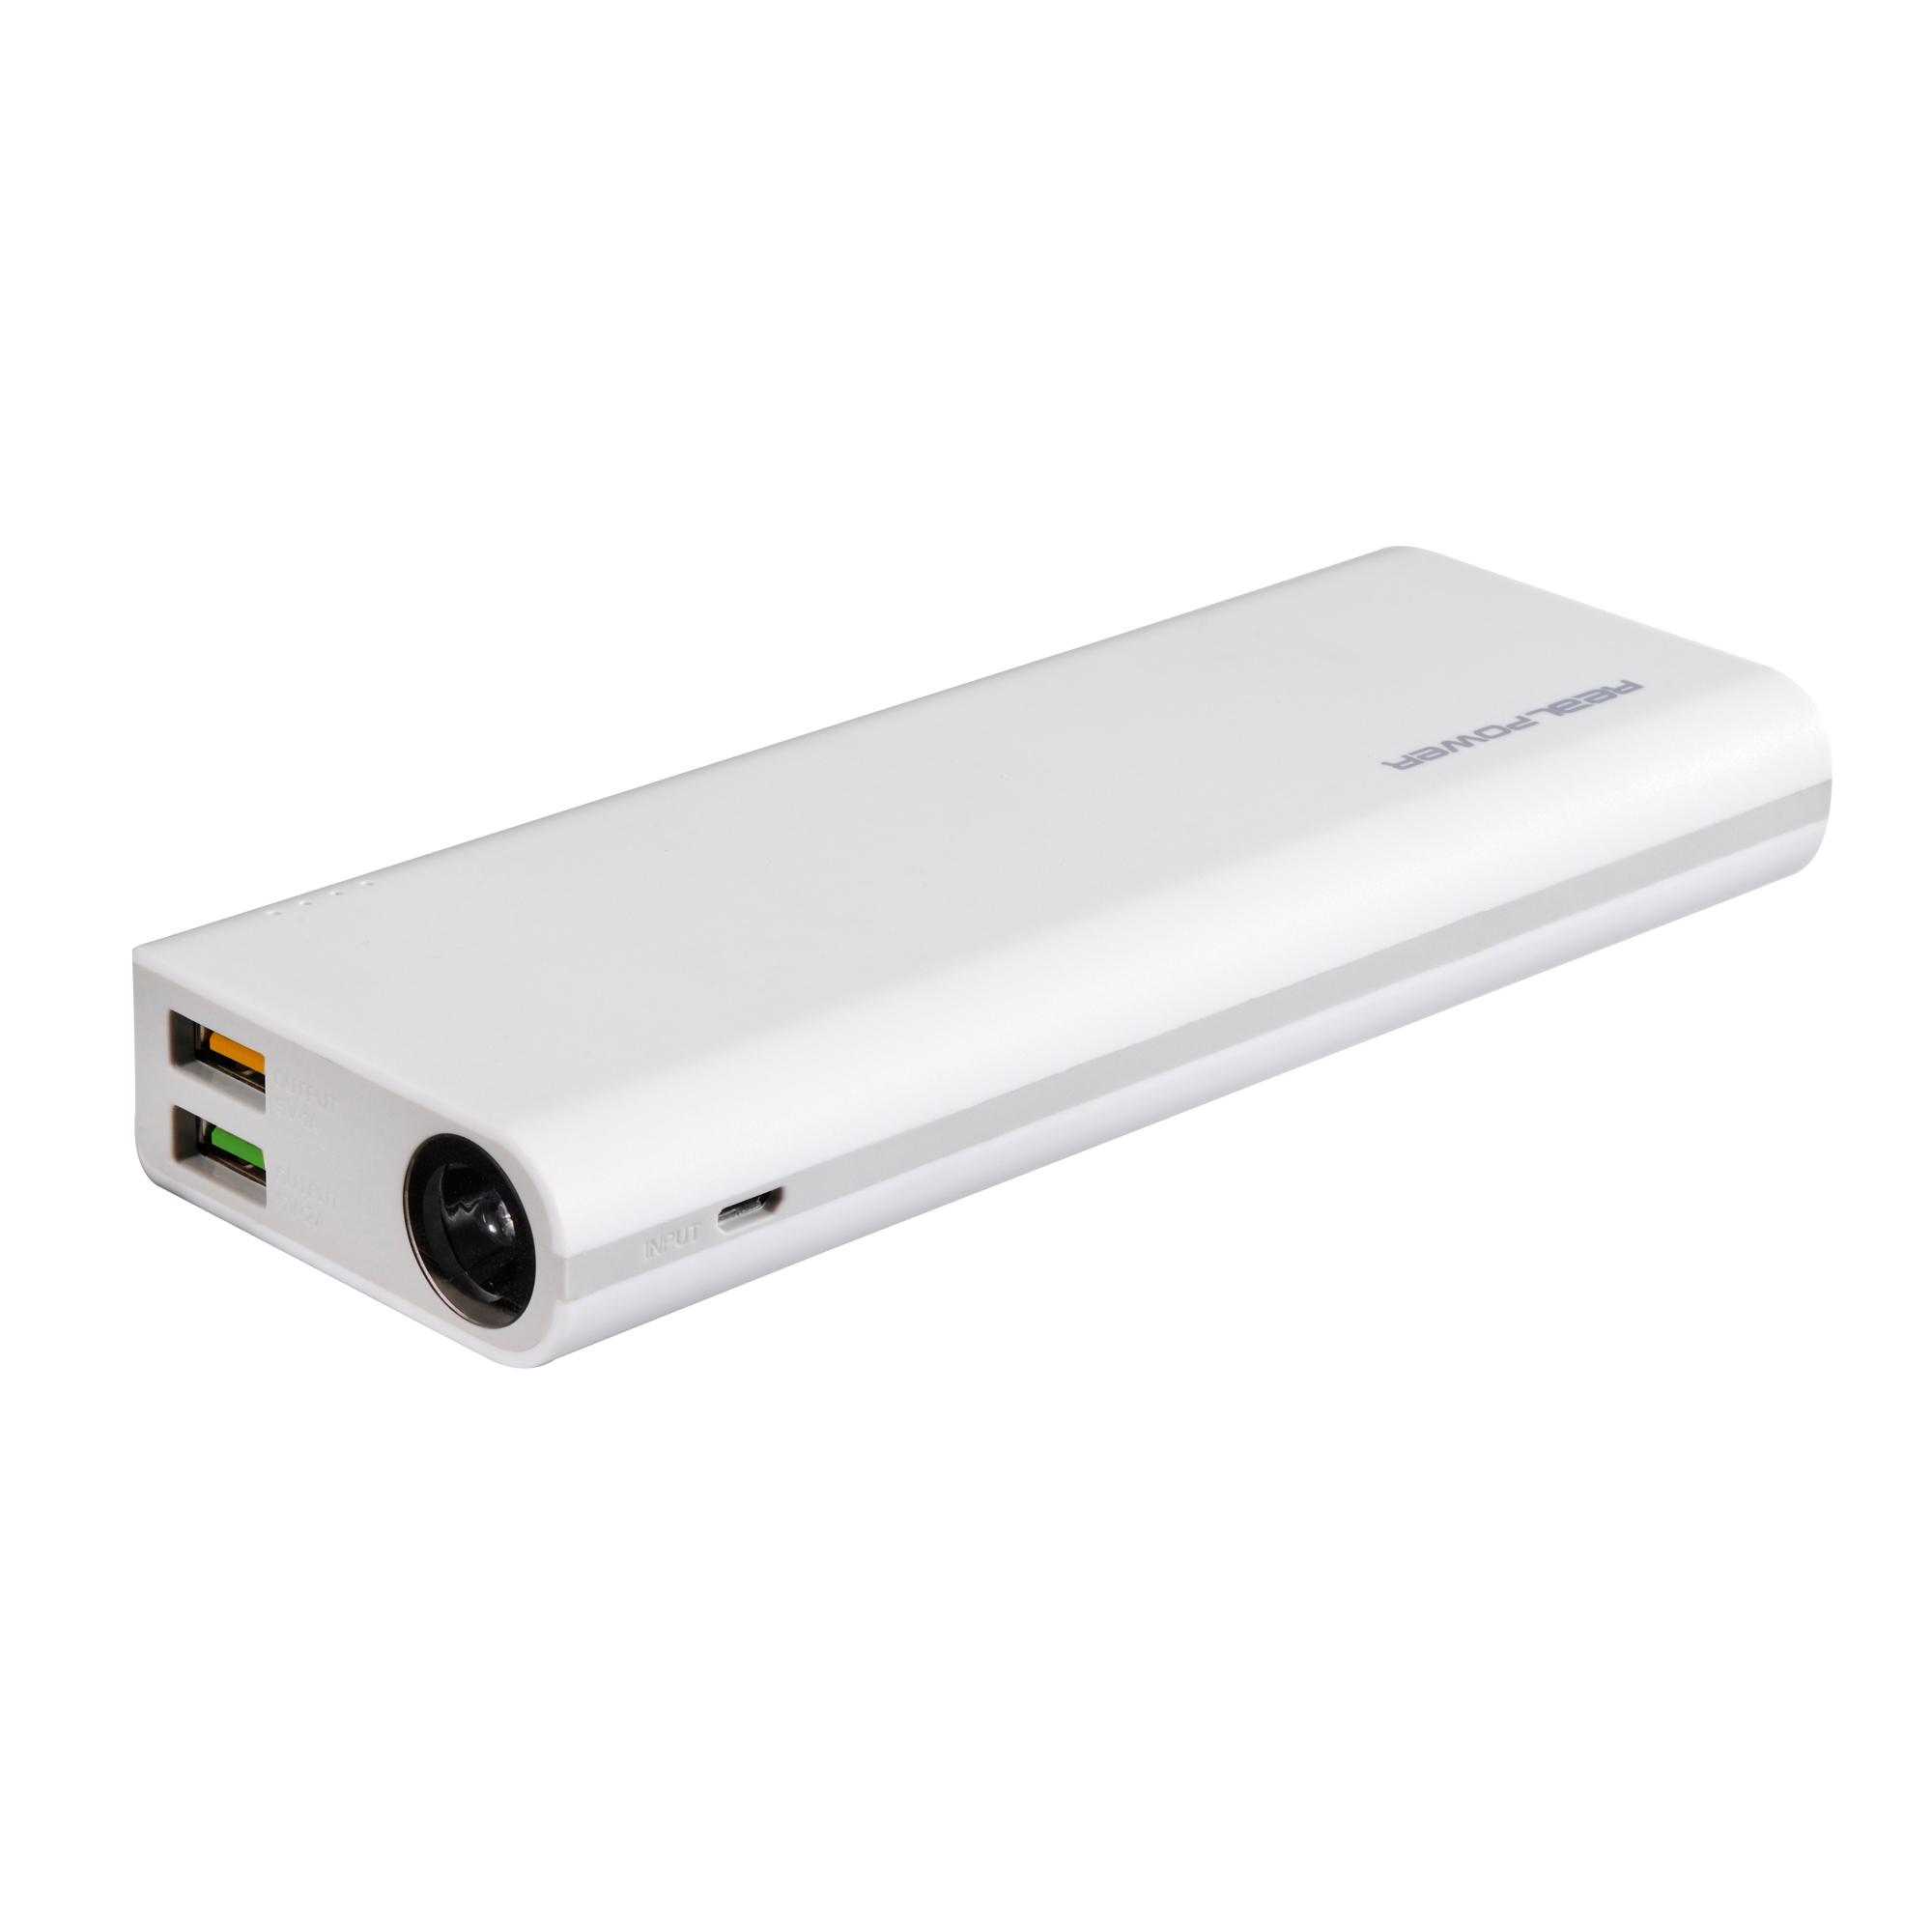 RealPower PB-12000 - Weiß - Universal - Rechteck - Lithium-Ion (Li-Ion) - 12000 mAh - USB